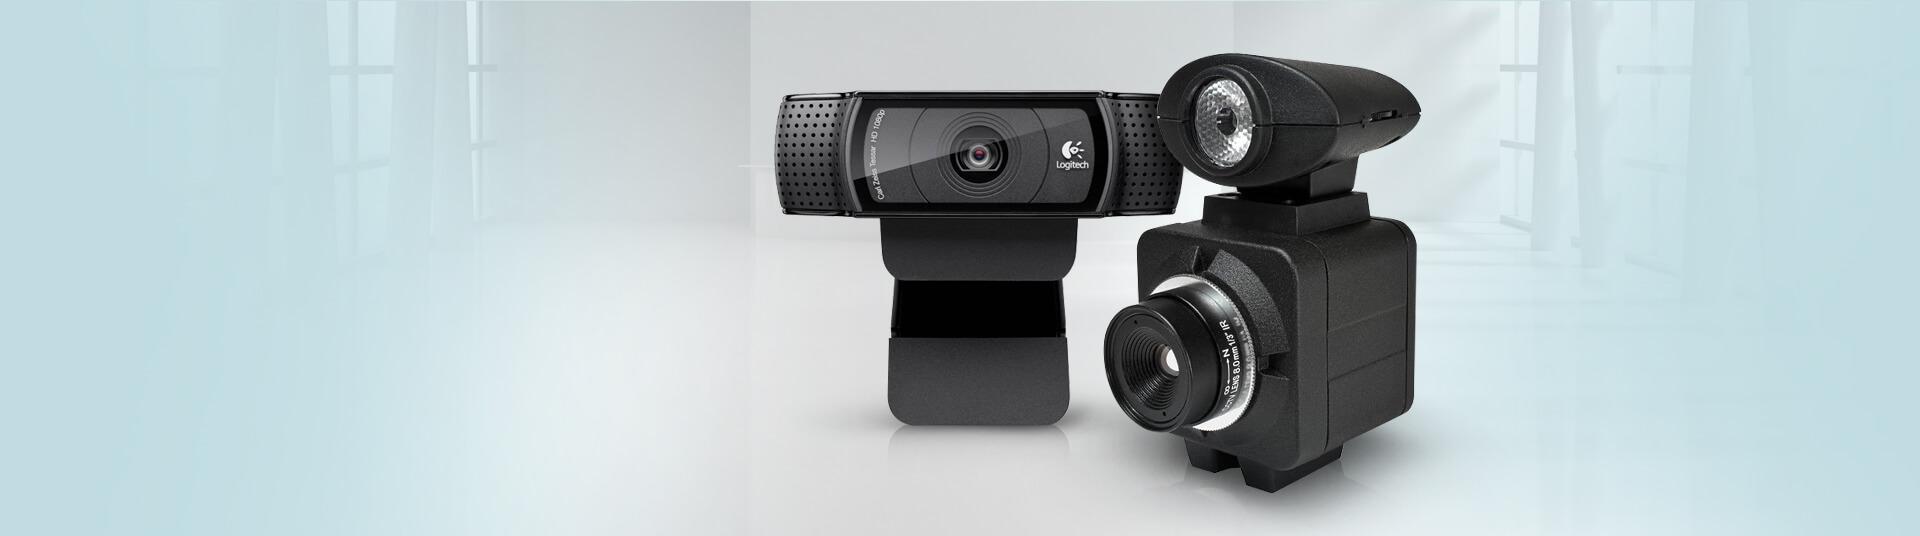 Digital ID Cameras